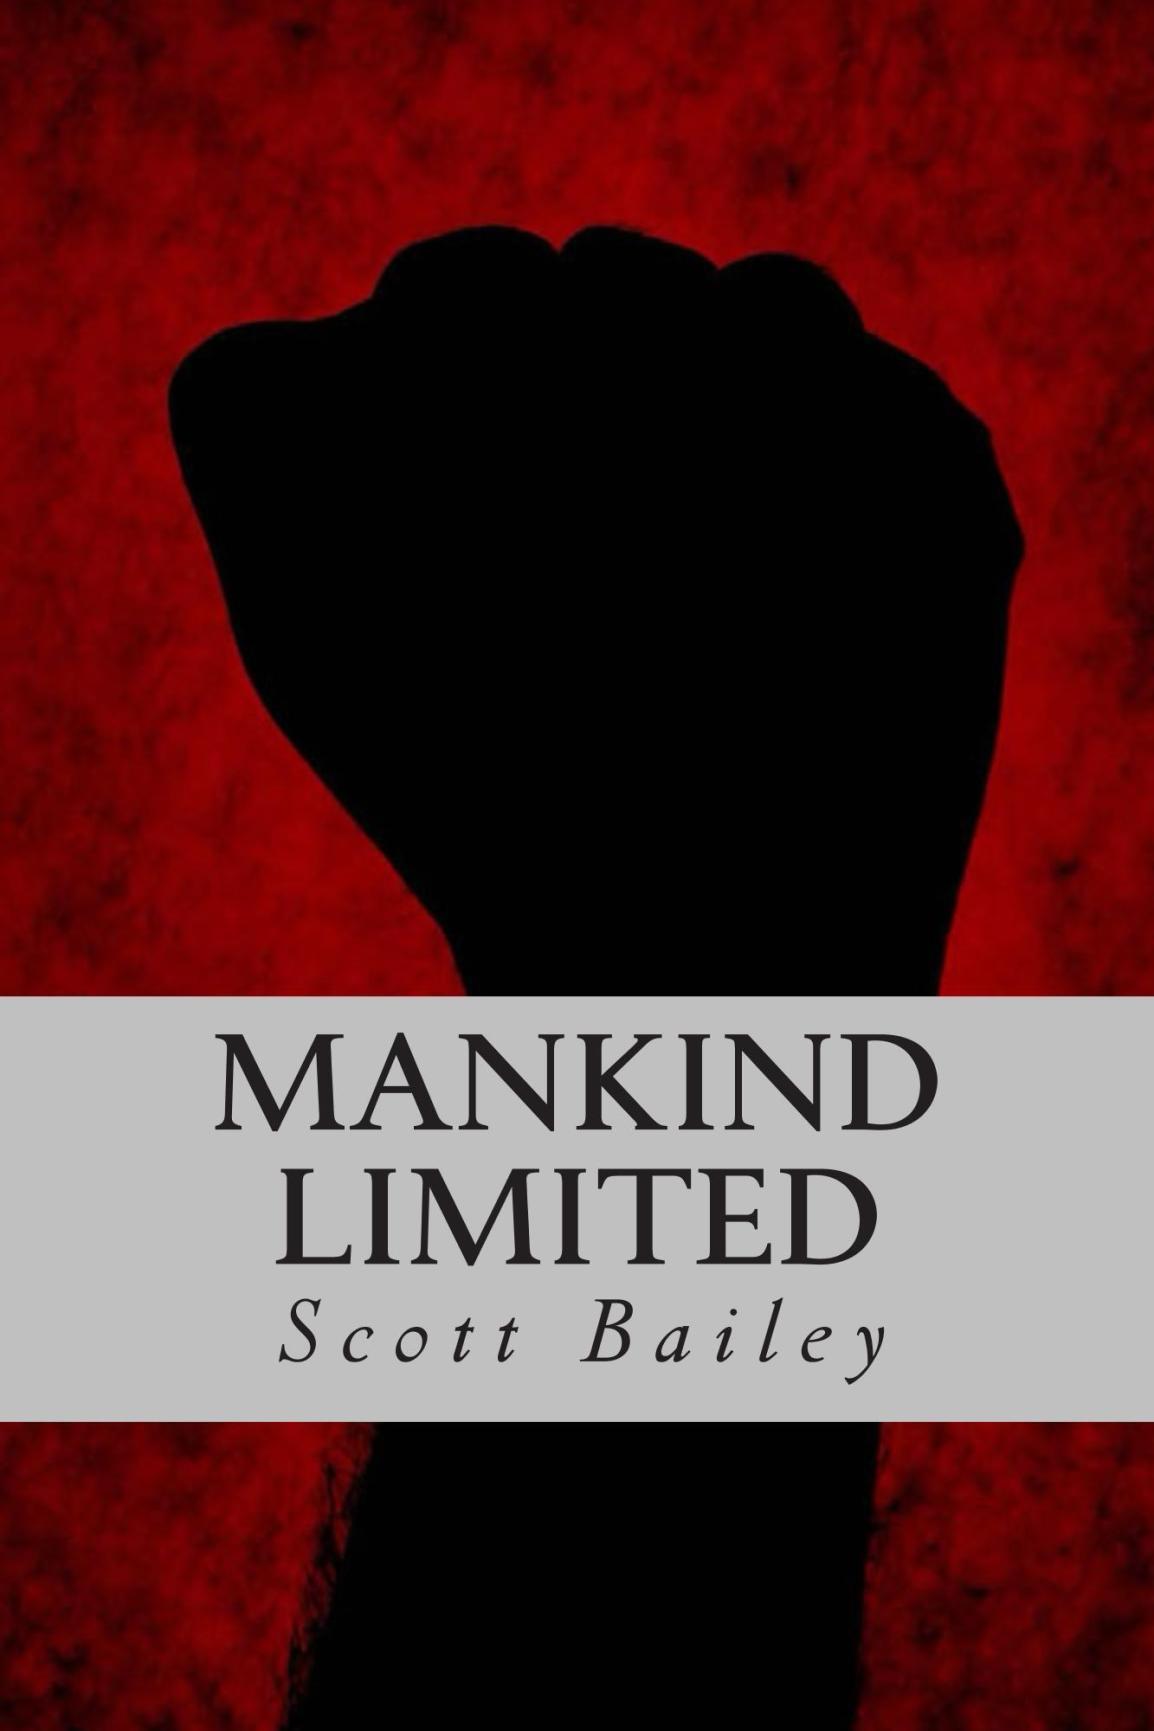 Mankind Limited Excerpt